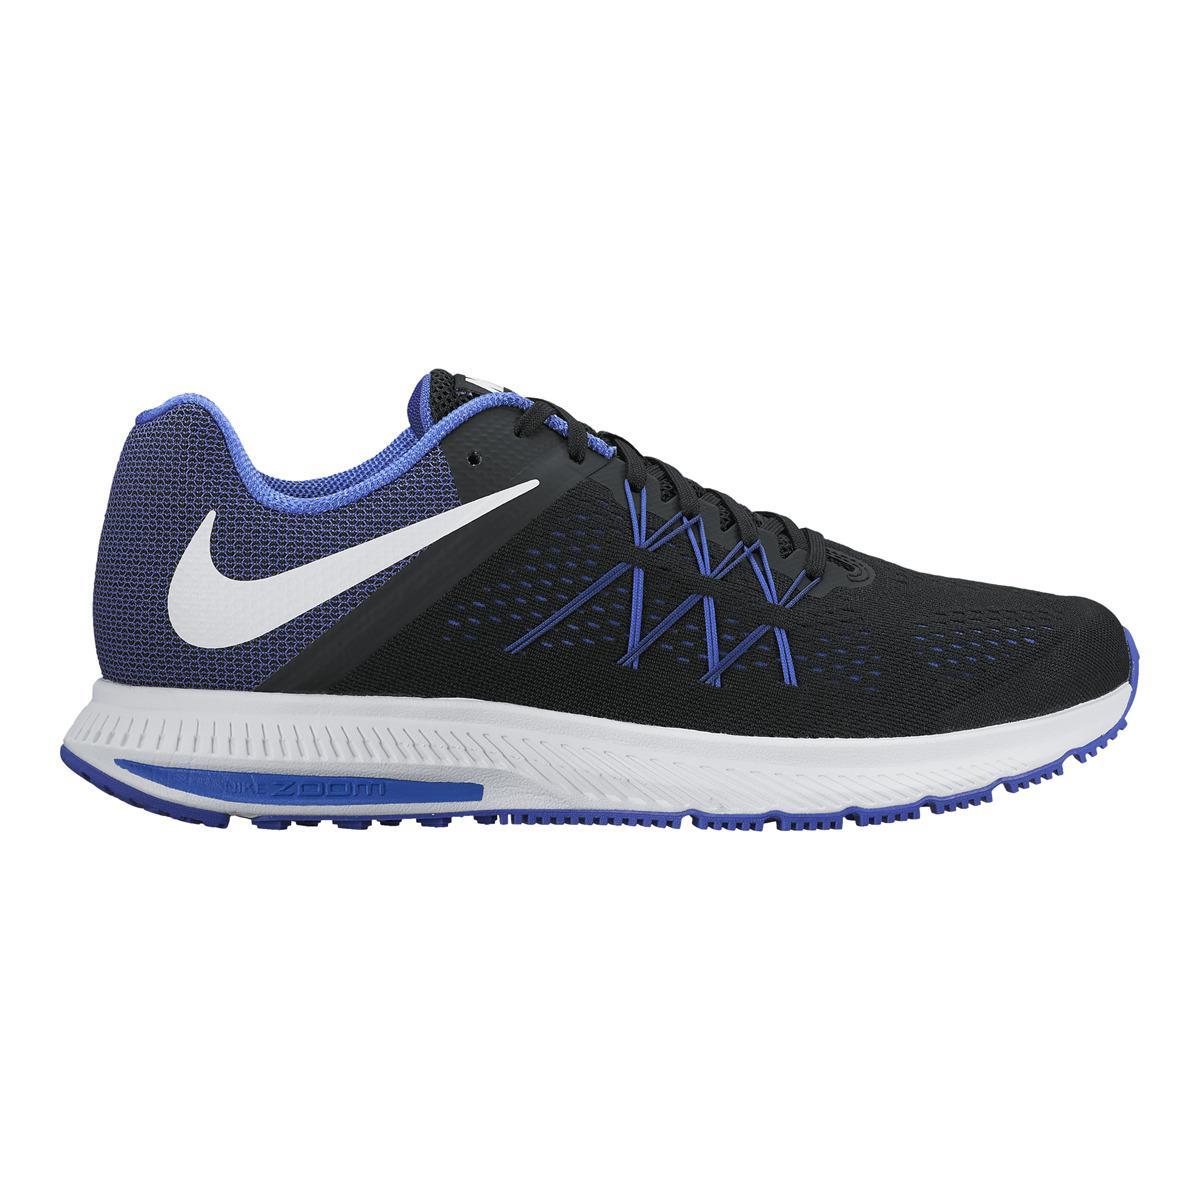 Nike Men S Zoom Winflo  Running Shoes